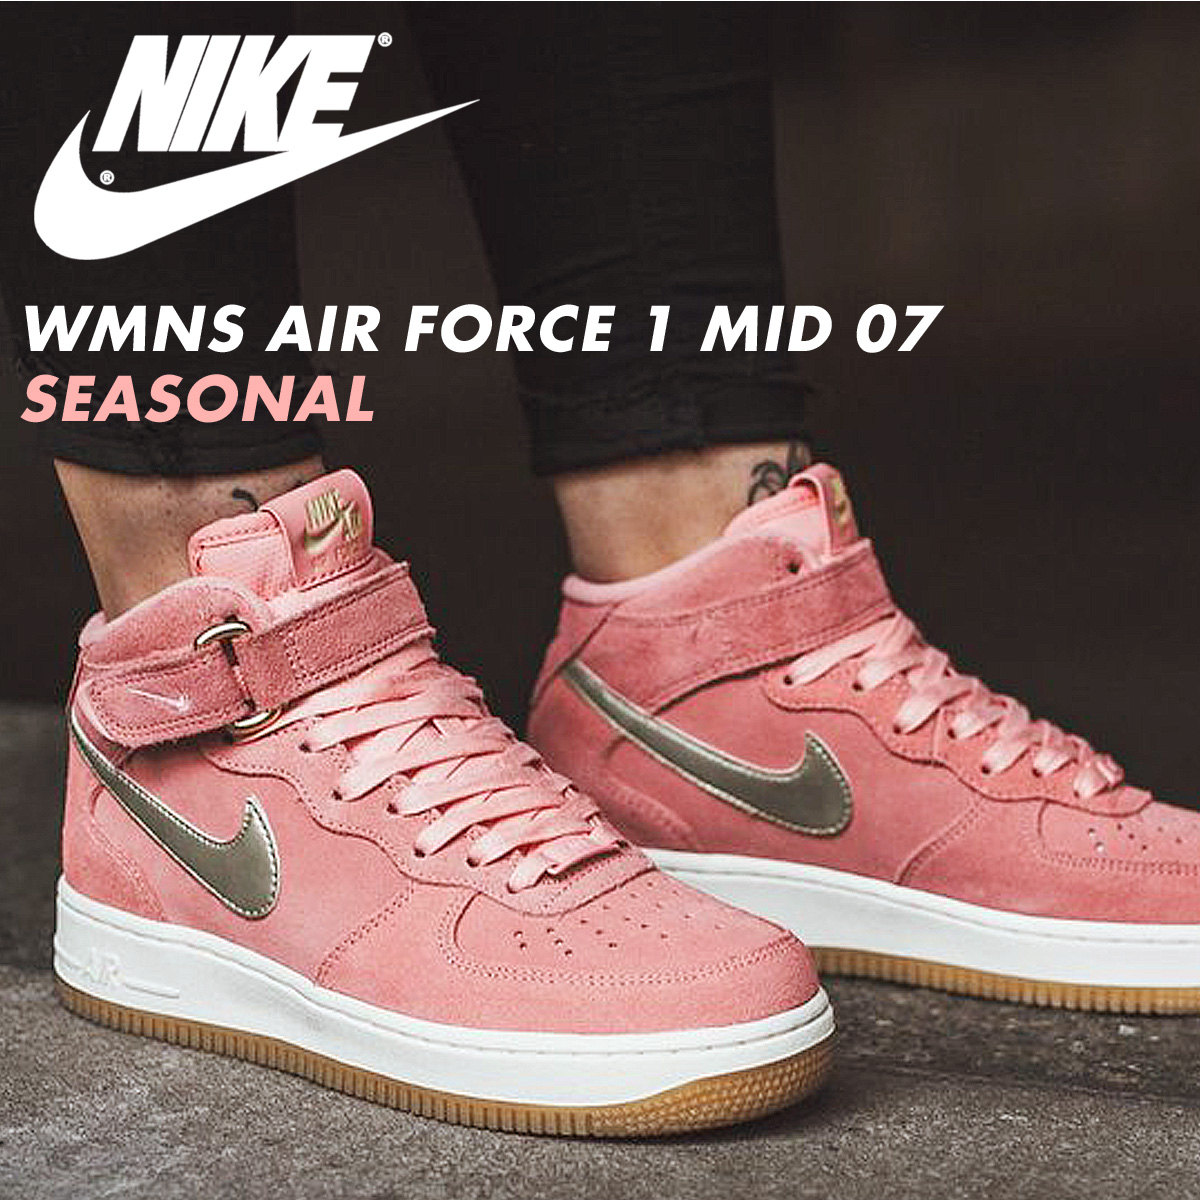 93b2330a30e new arrivals mens pink nike air force 1 8299f c410c